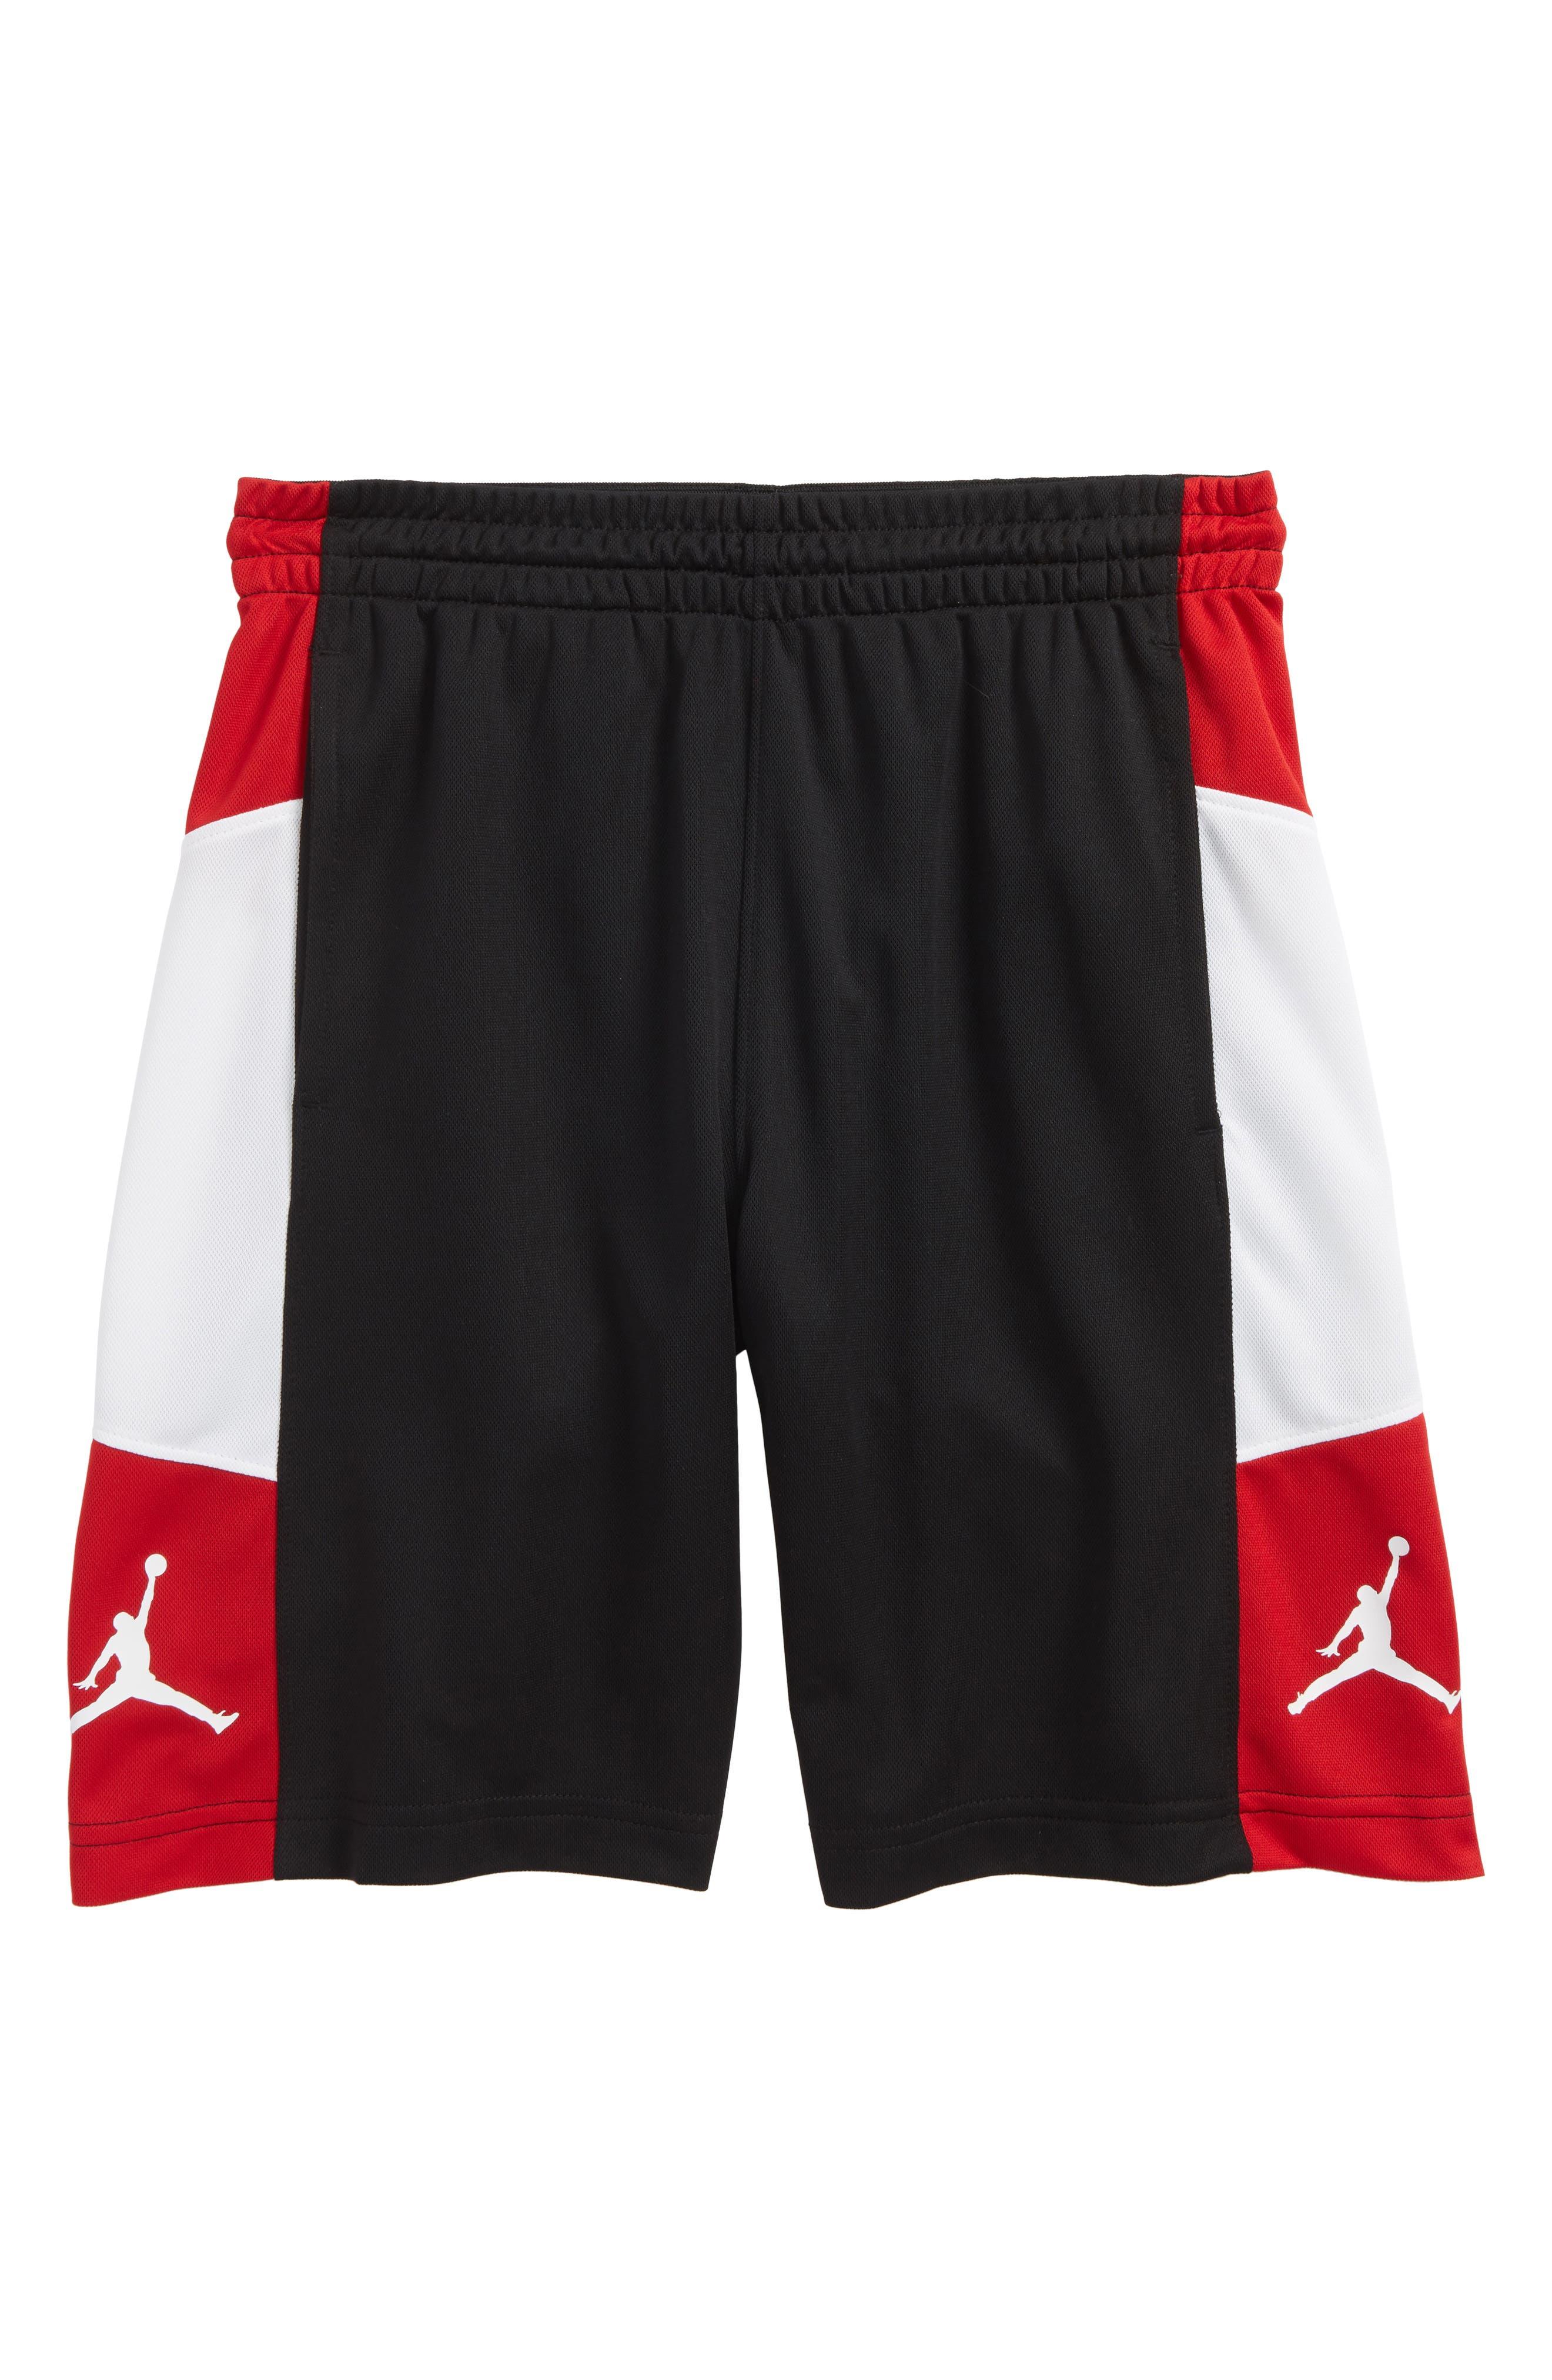 Jordan Elevate Shorts,                         Main,                         color, Black